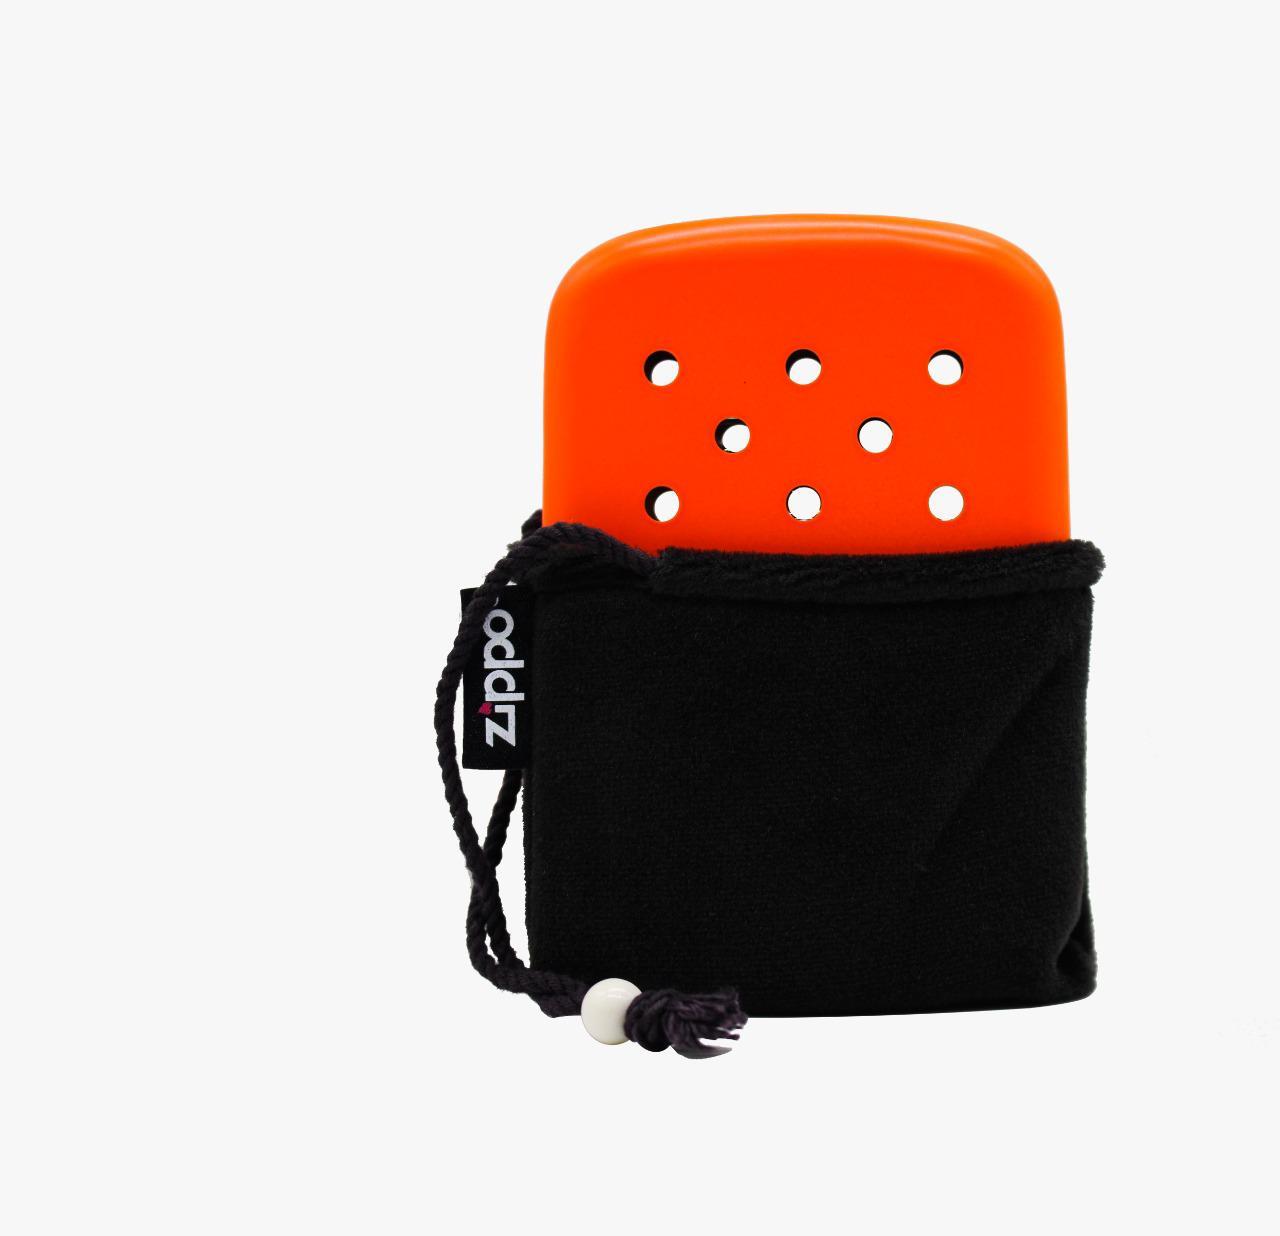 Aquecedor Zippo Hand Warnmer Orange